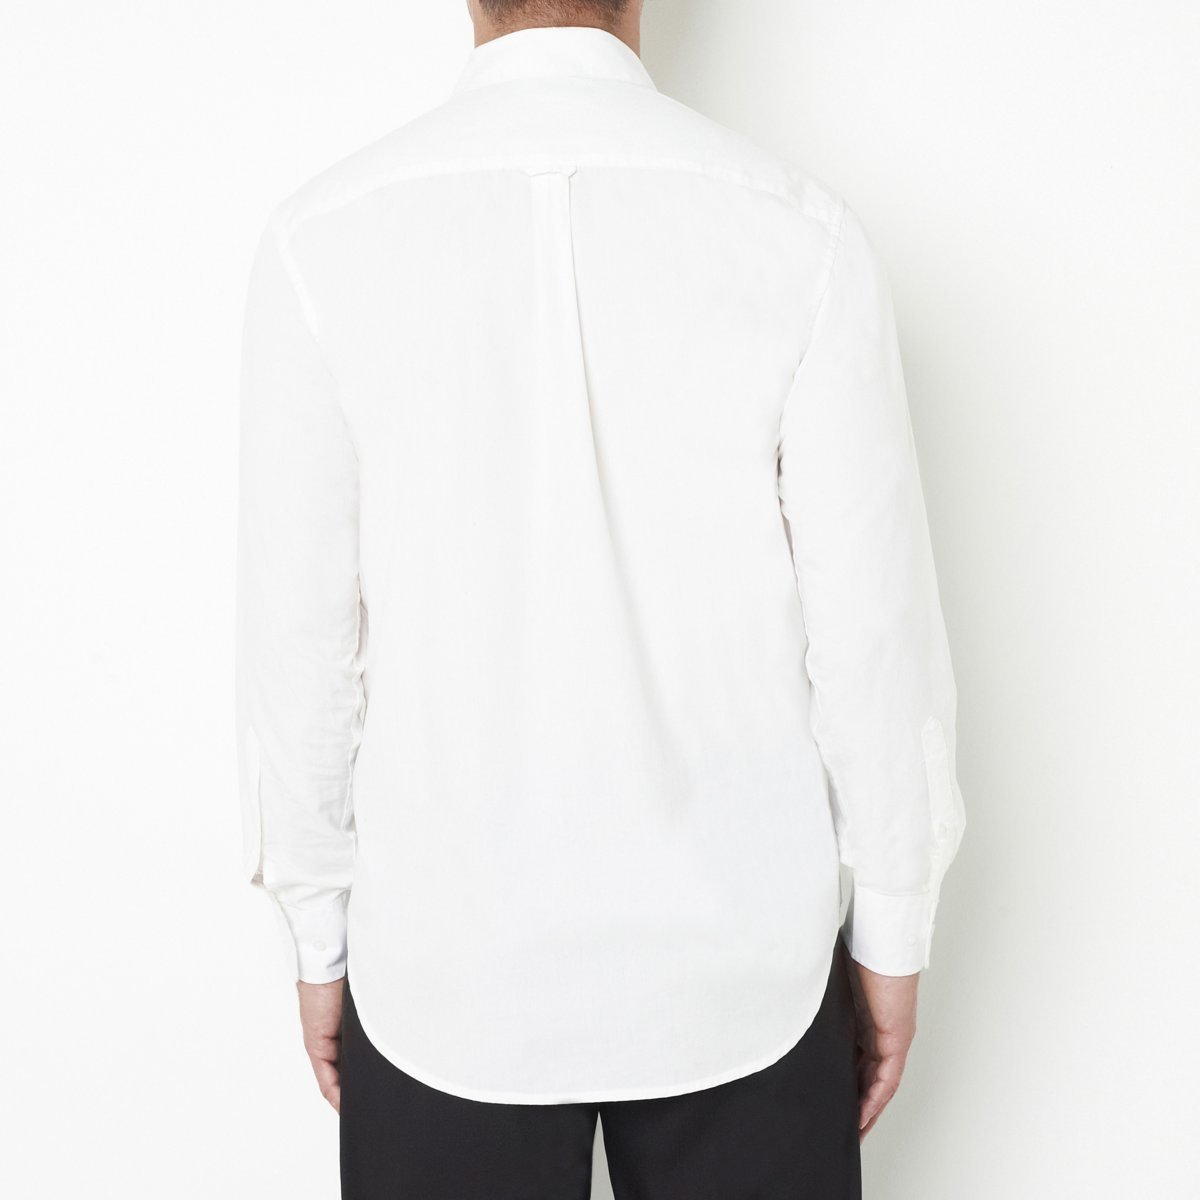 La Redoute Castaluna for Men Mens Extra Long Long-Sleeved Cotton Poplin Shirt